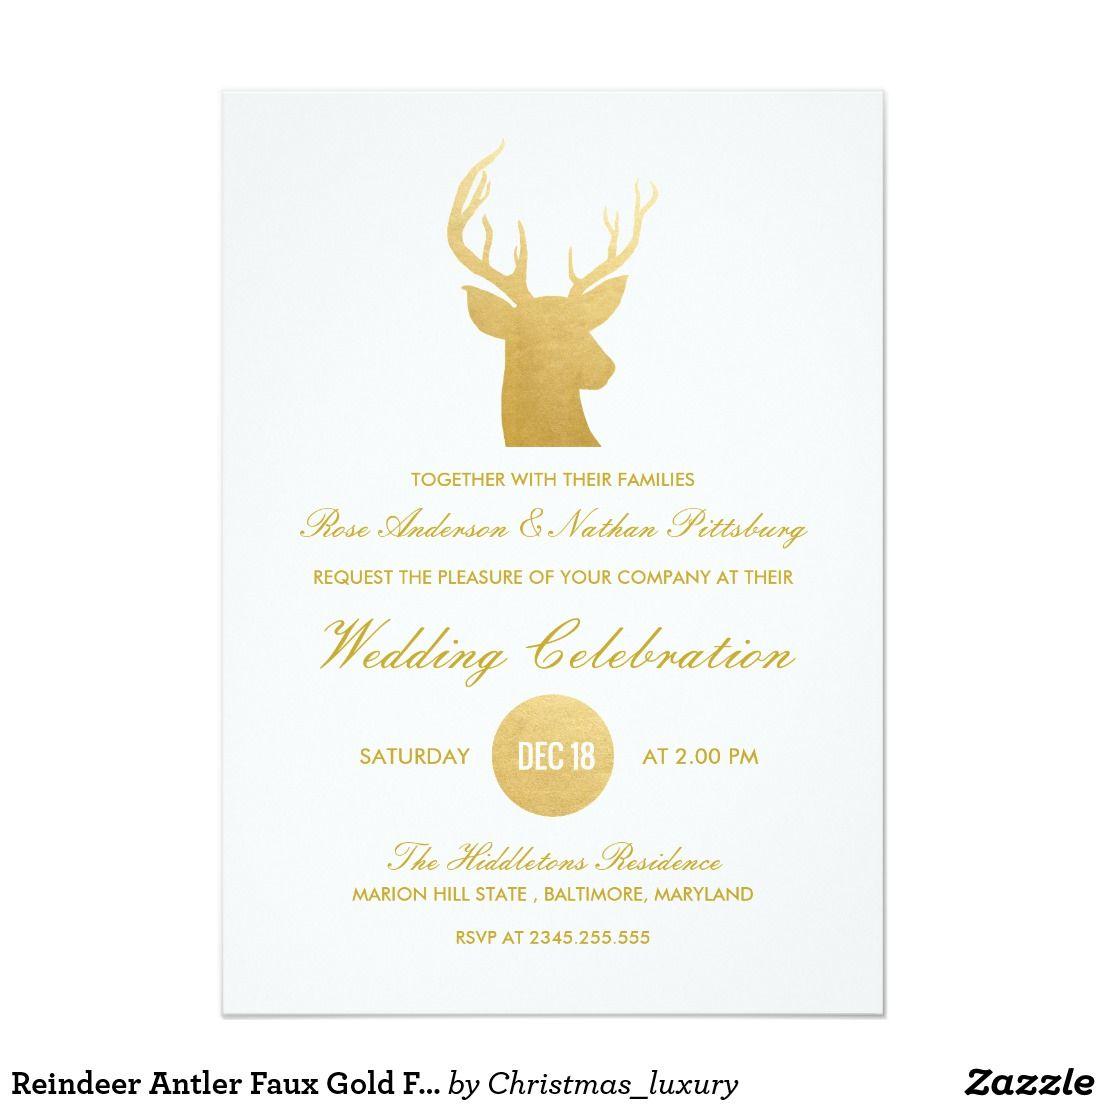 Reindeer Antler Faux Gold Foil Winter Wedding Wedding